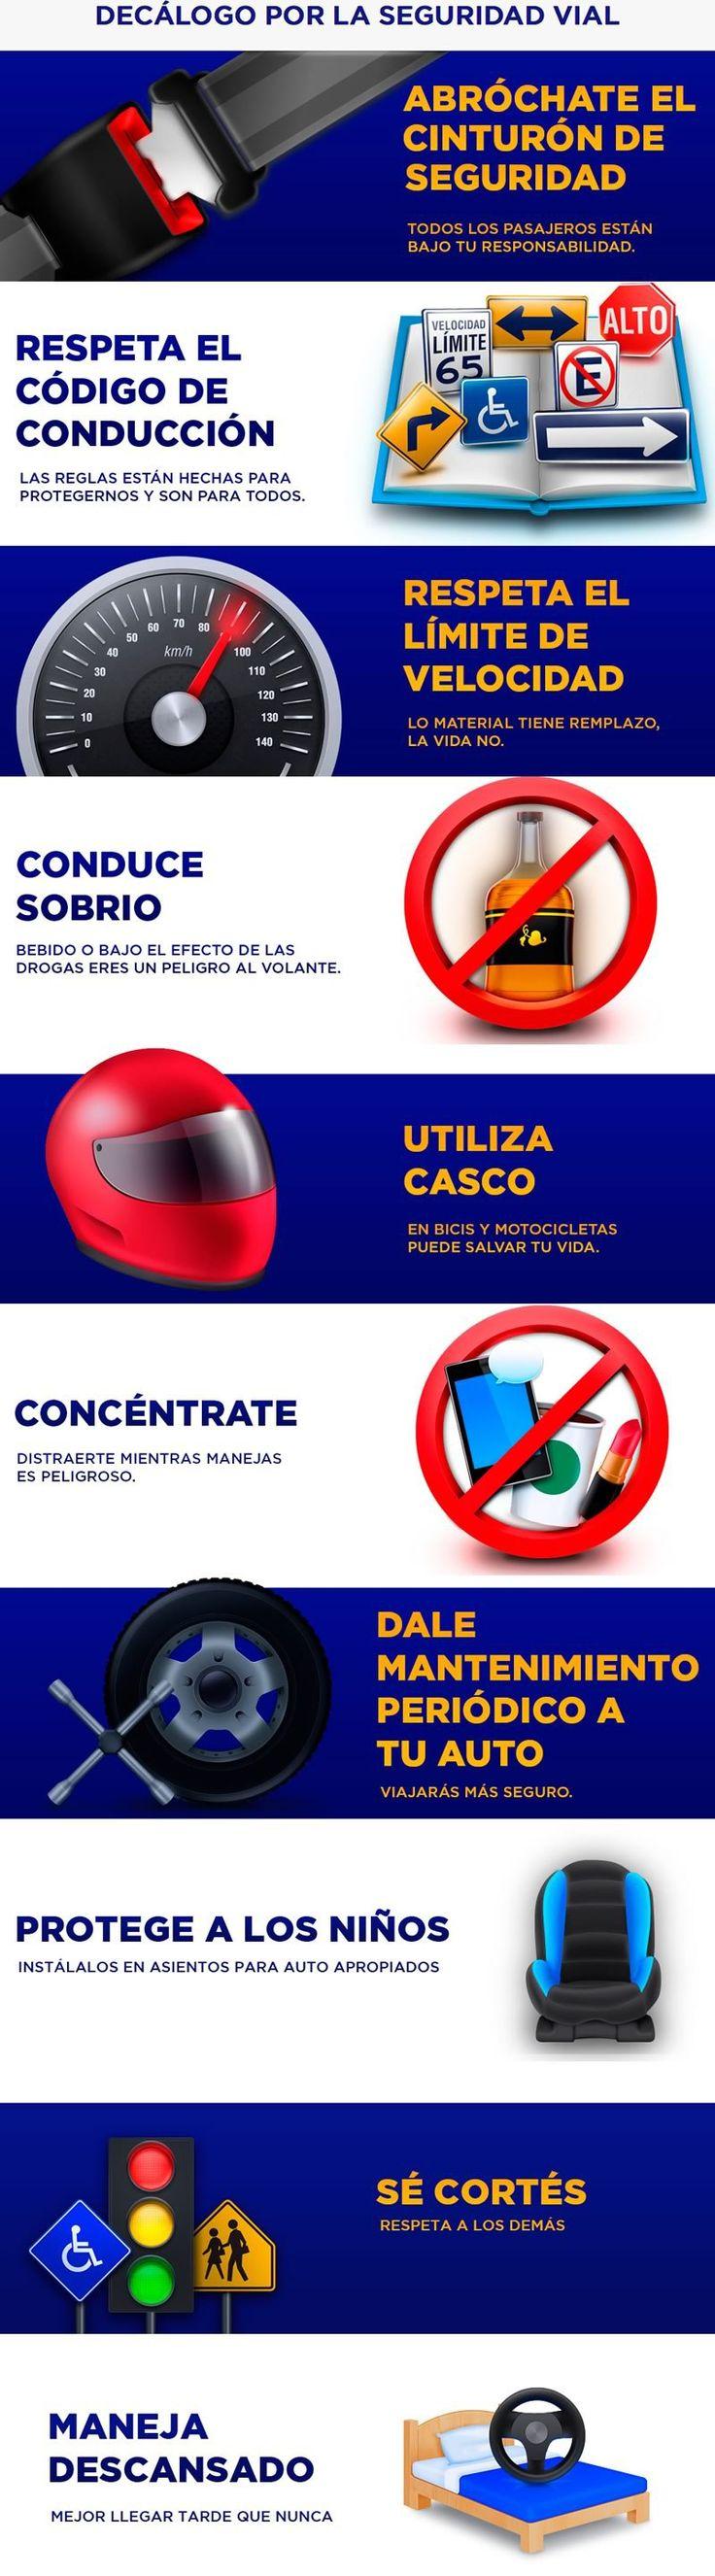 10 cosas que debes hacer para prevenir accidentes de tránsito